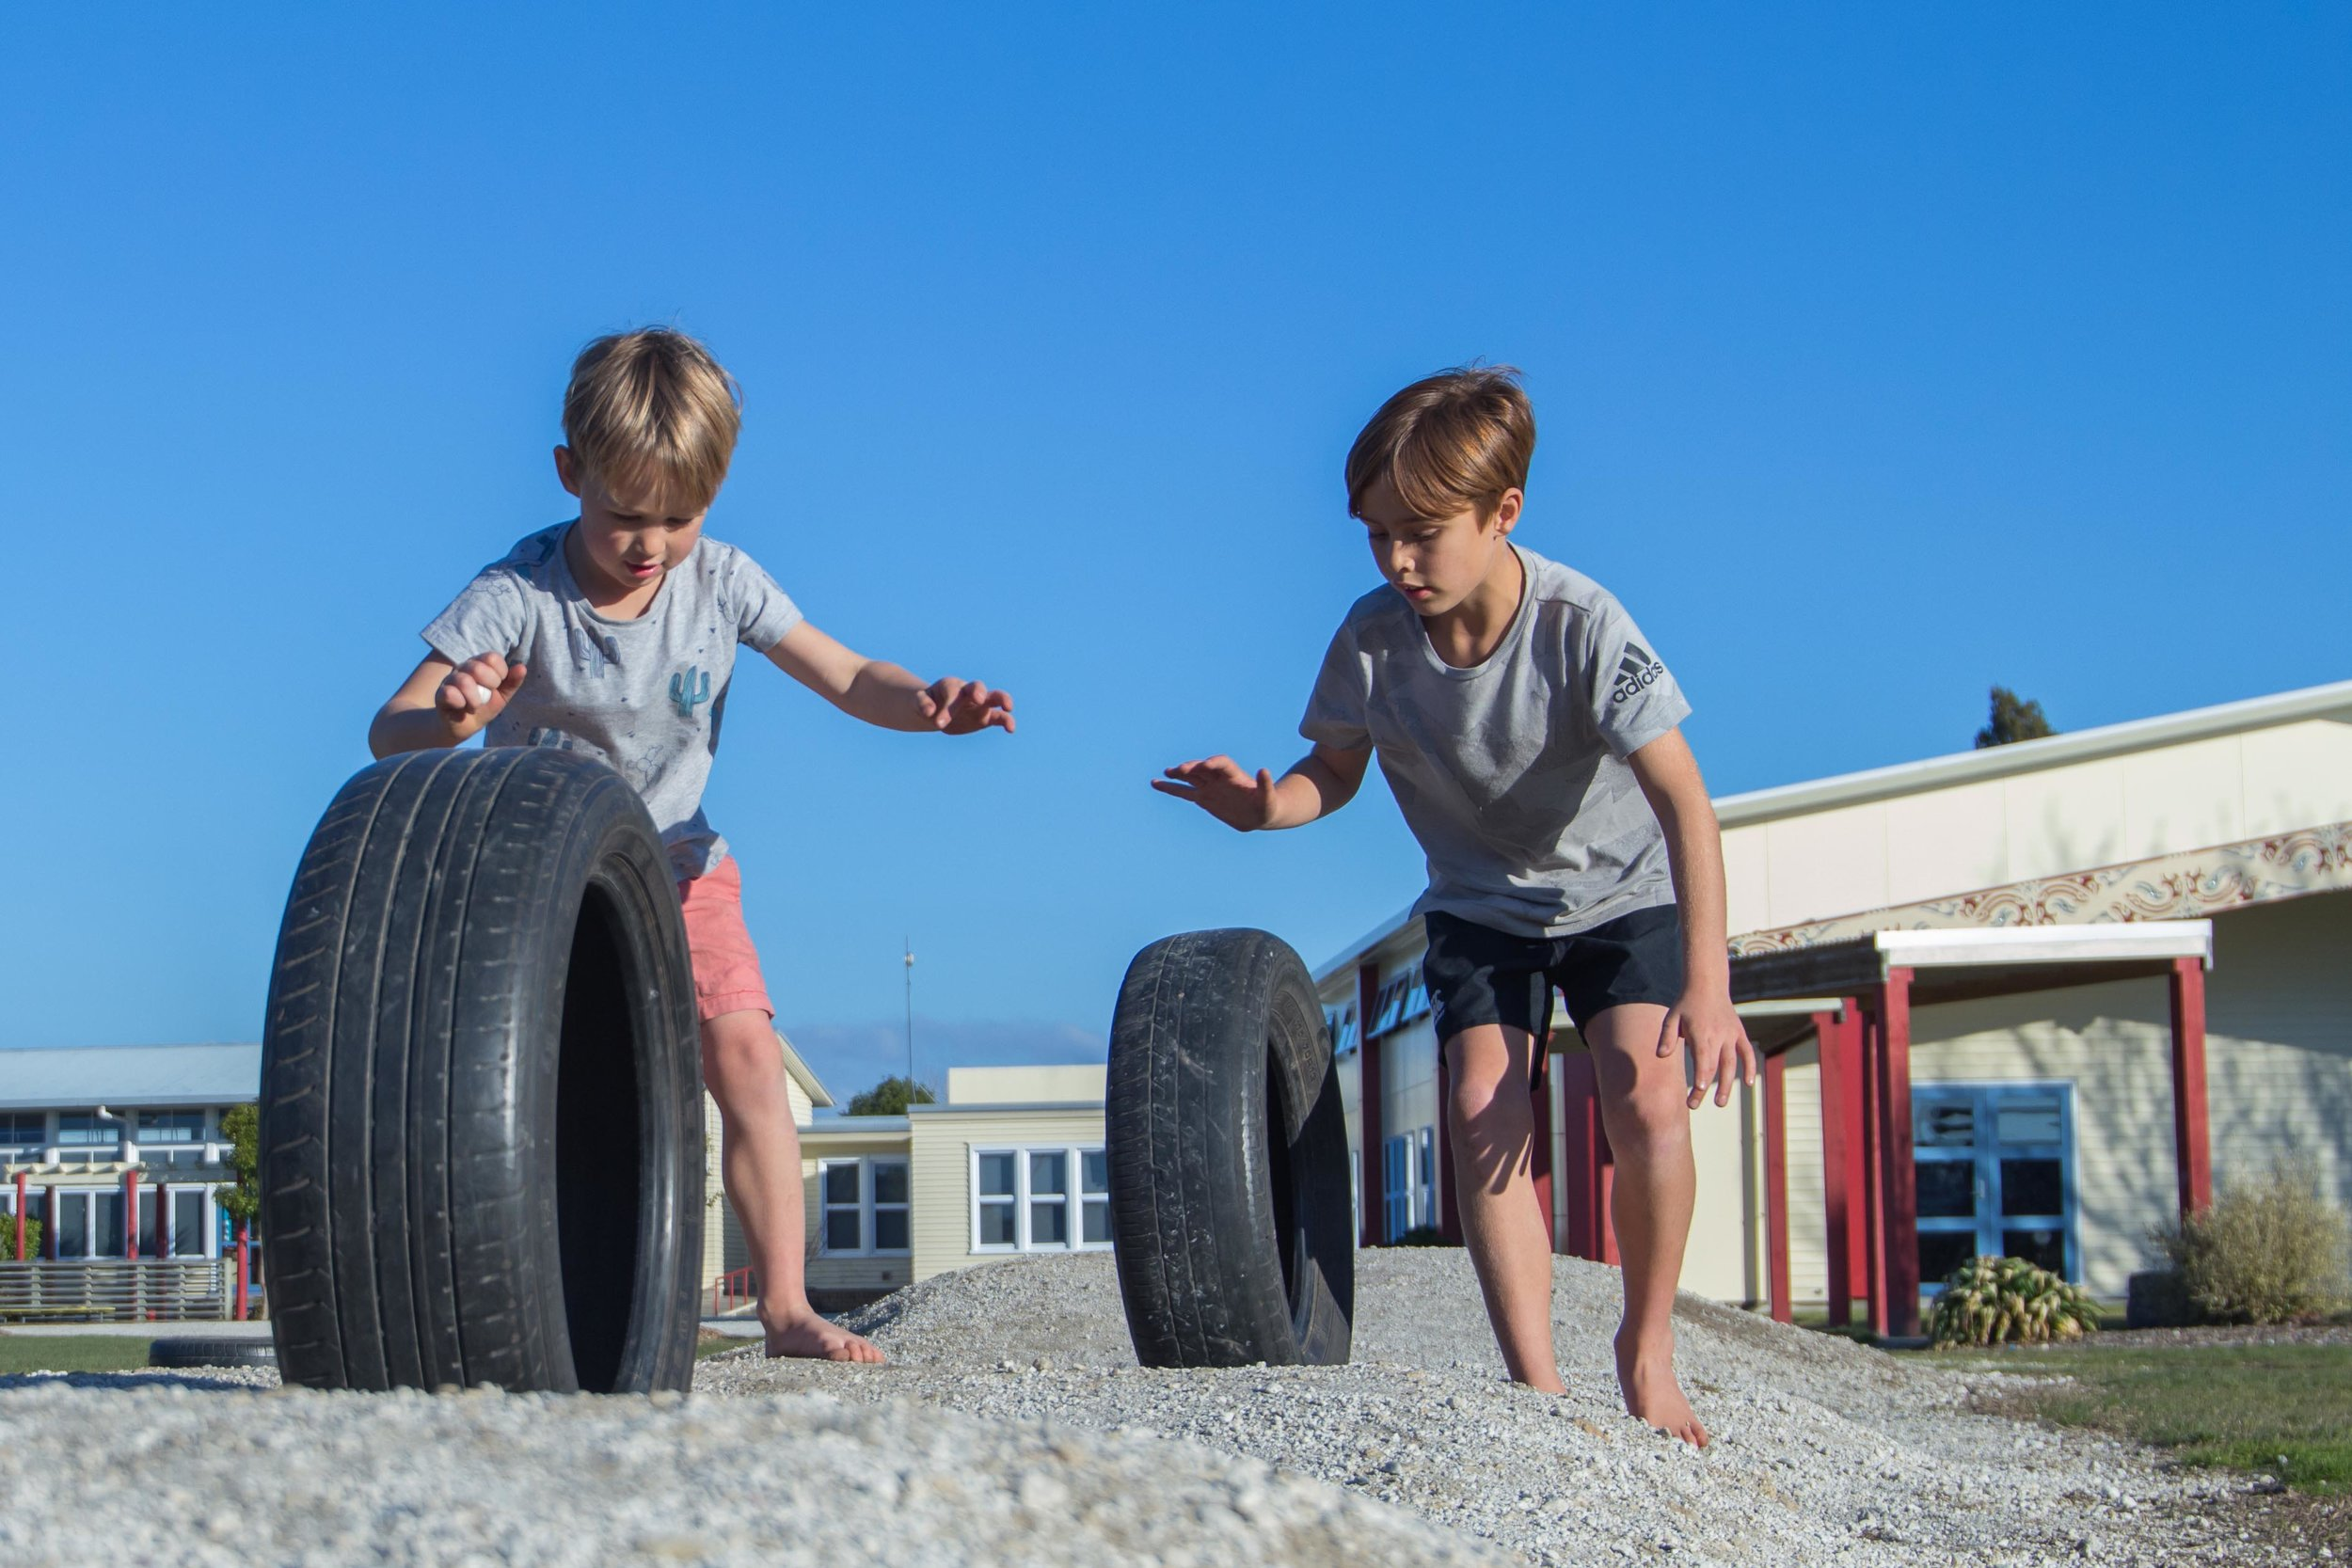 TePunaTaiao-Tyres-HighRes-8921.jpg